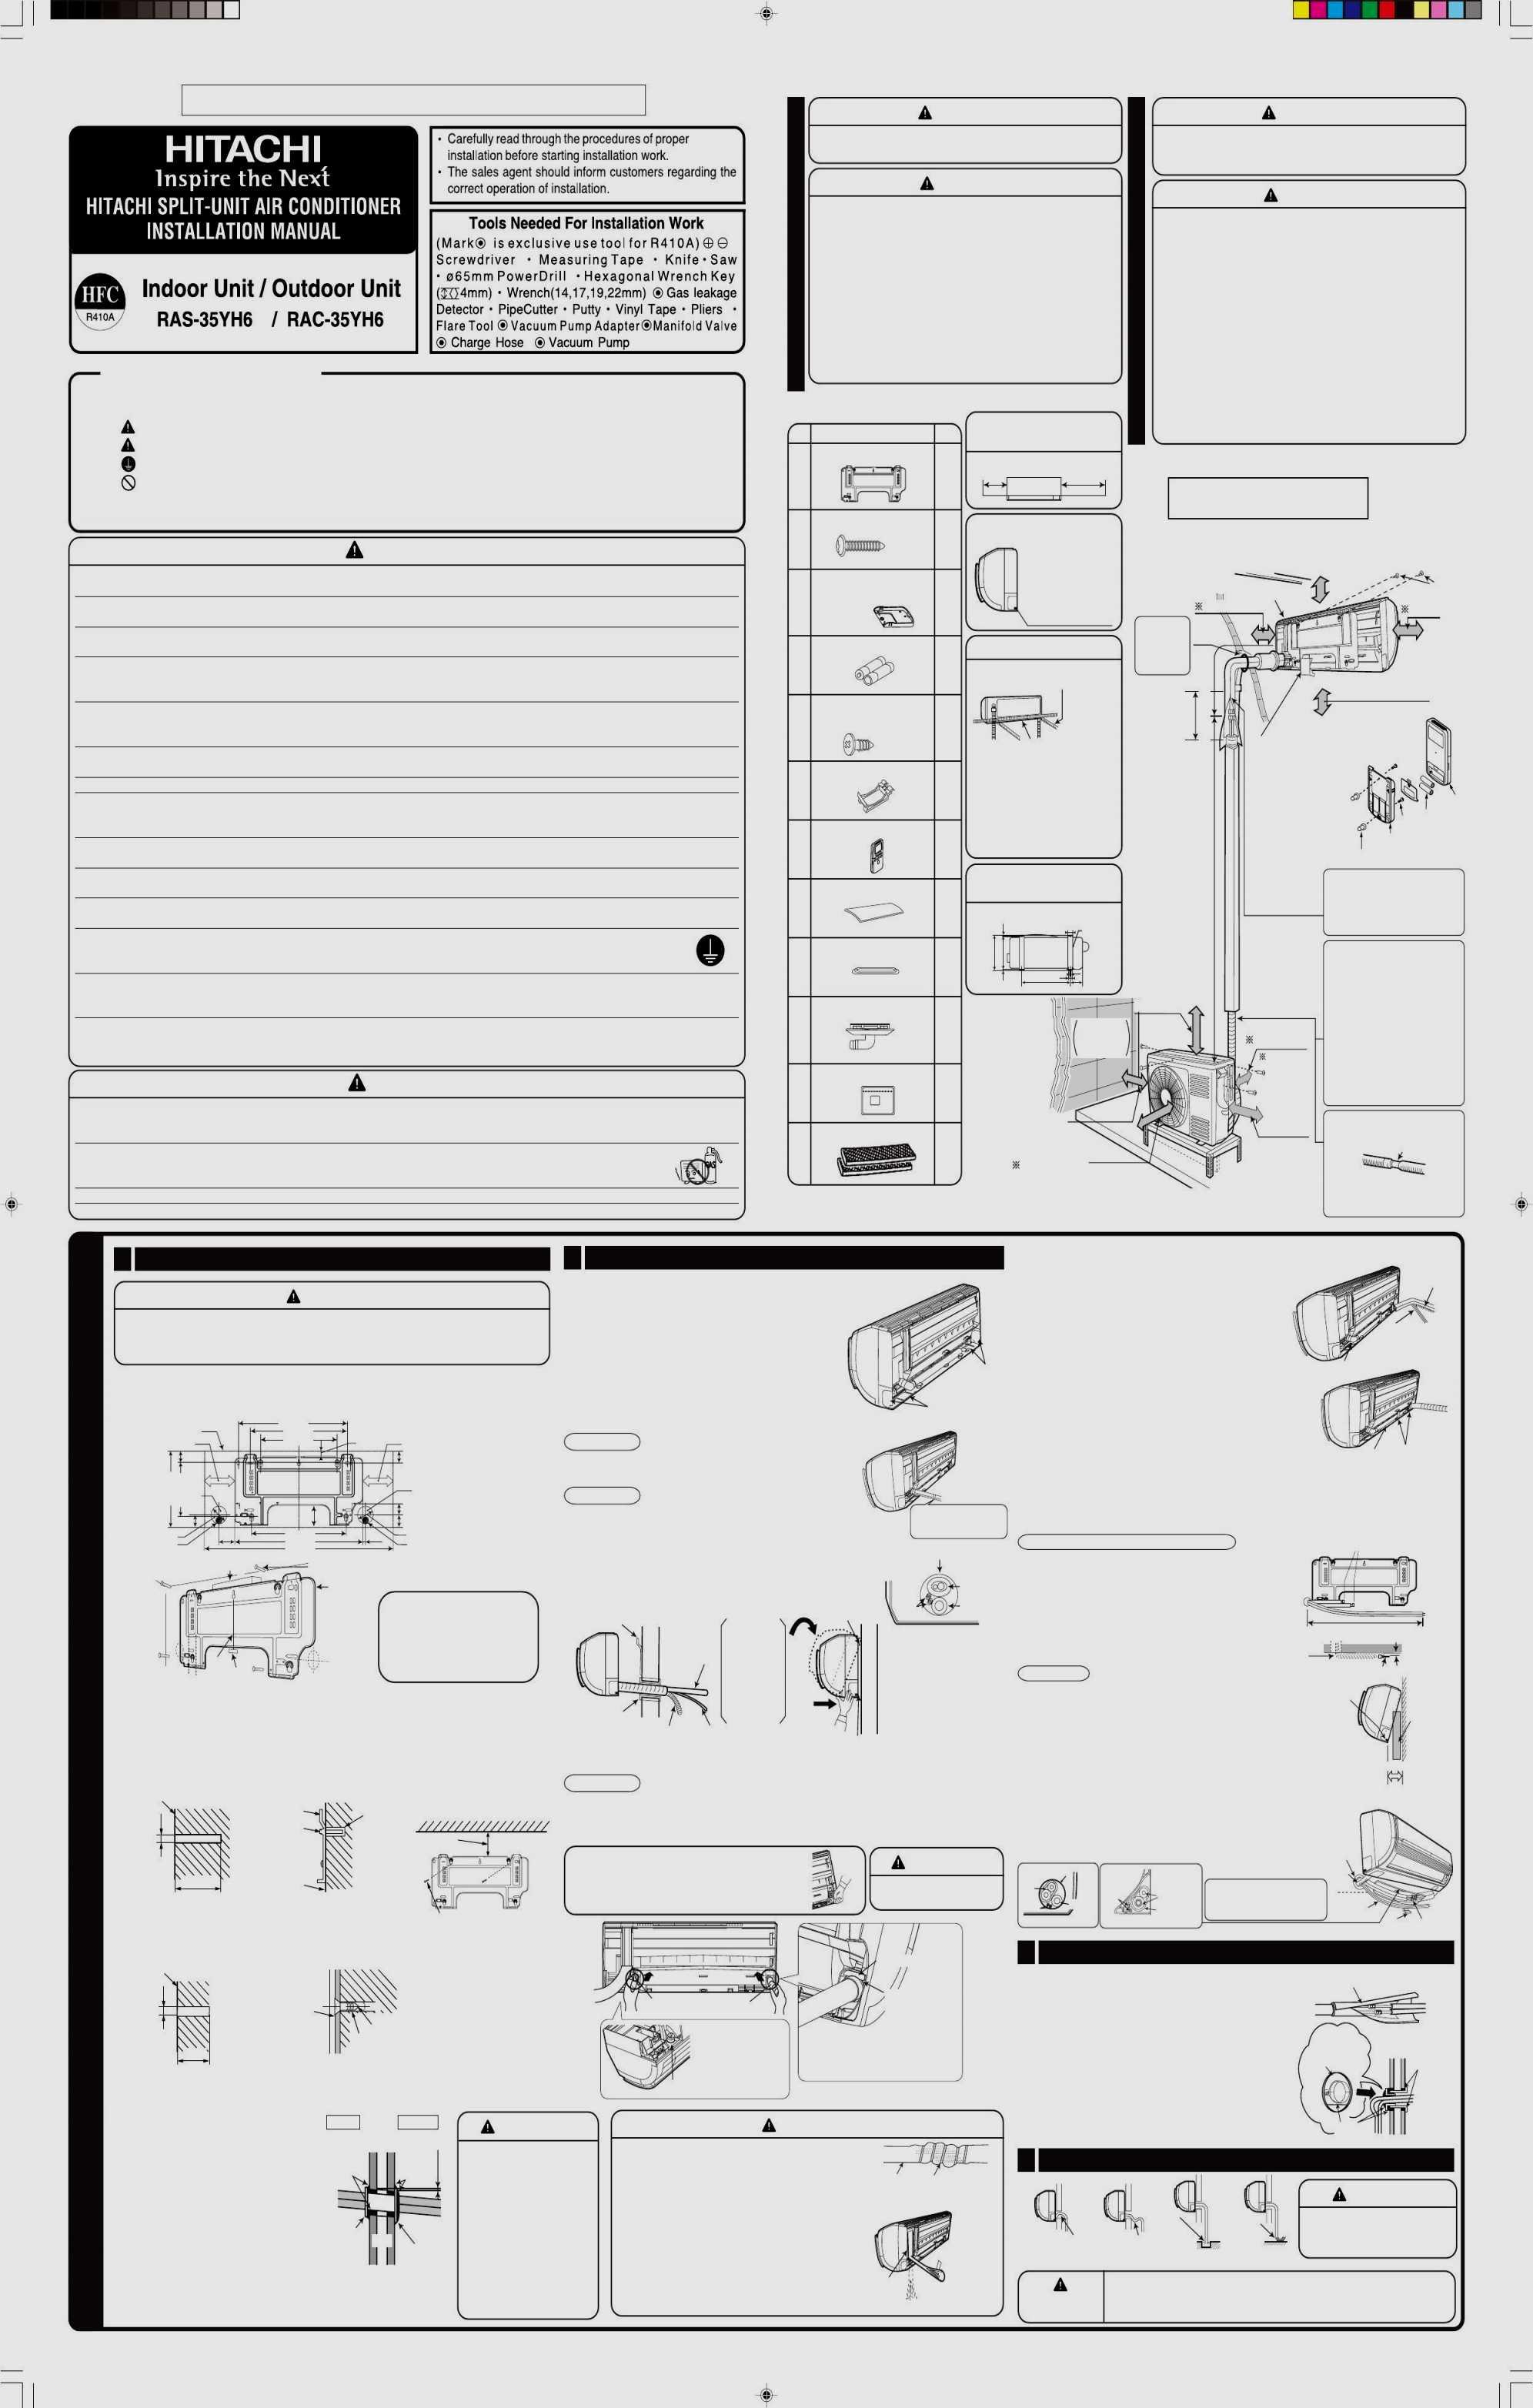 3 Kicker Cvr 12 Series Wiring Diagram Free Download